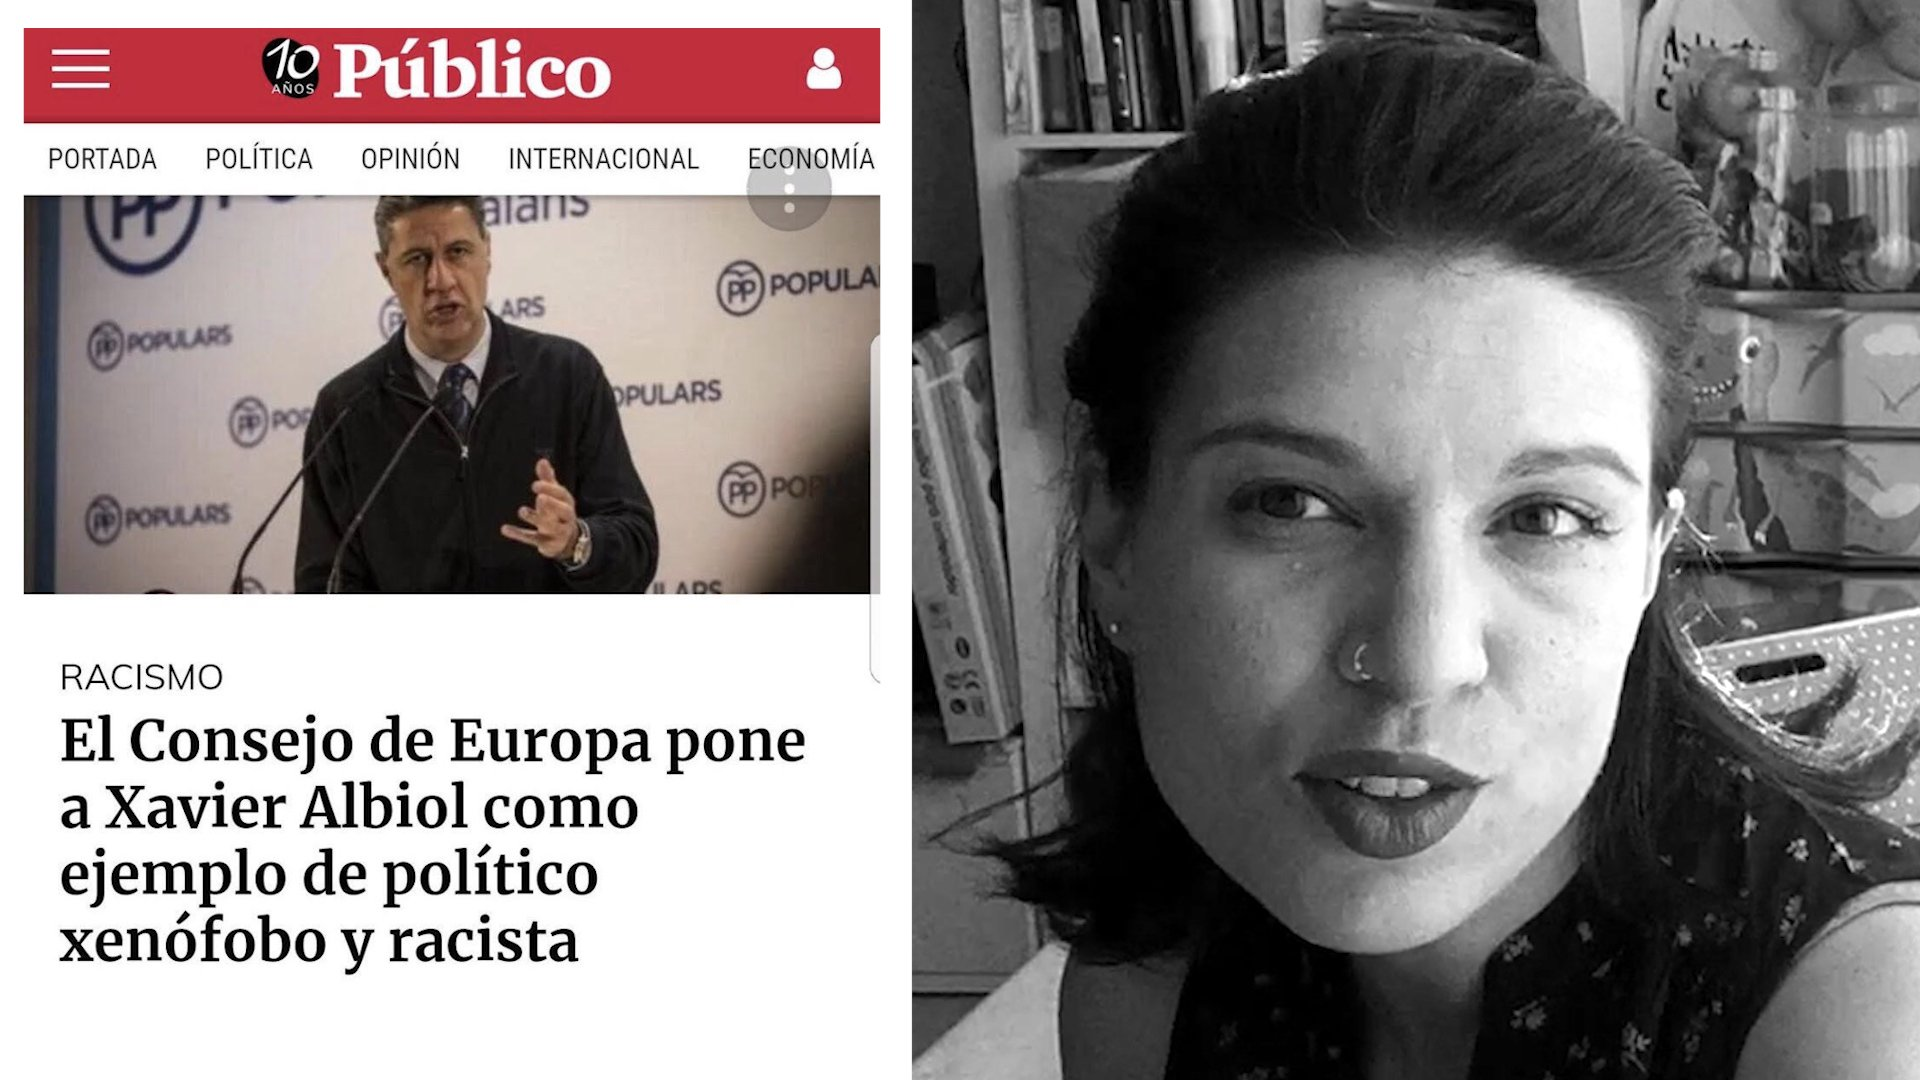 talegon racisme xenofobia videoblog - roberto lázaro